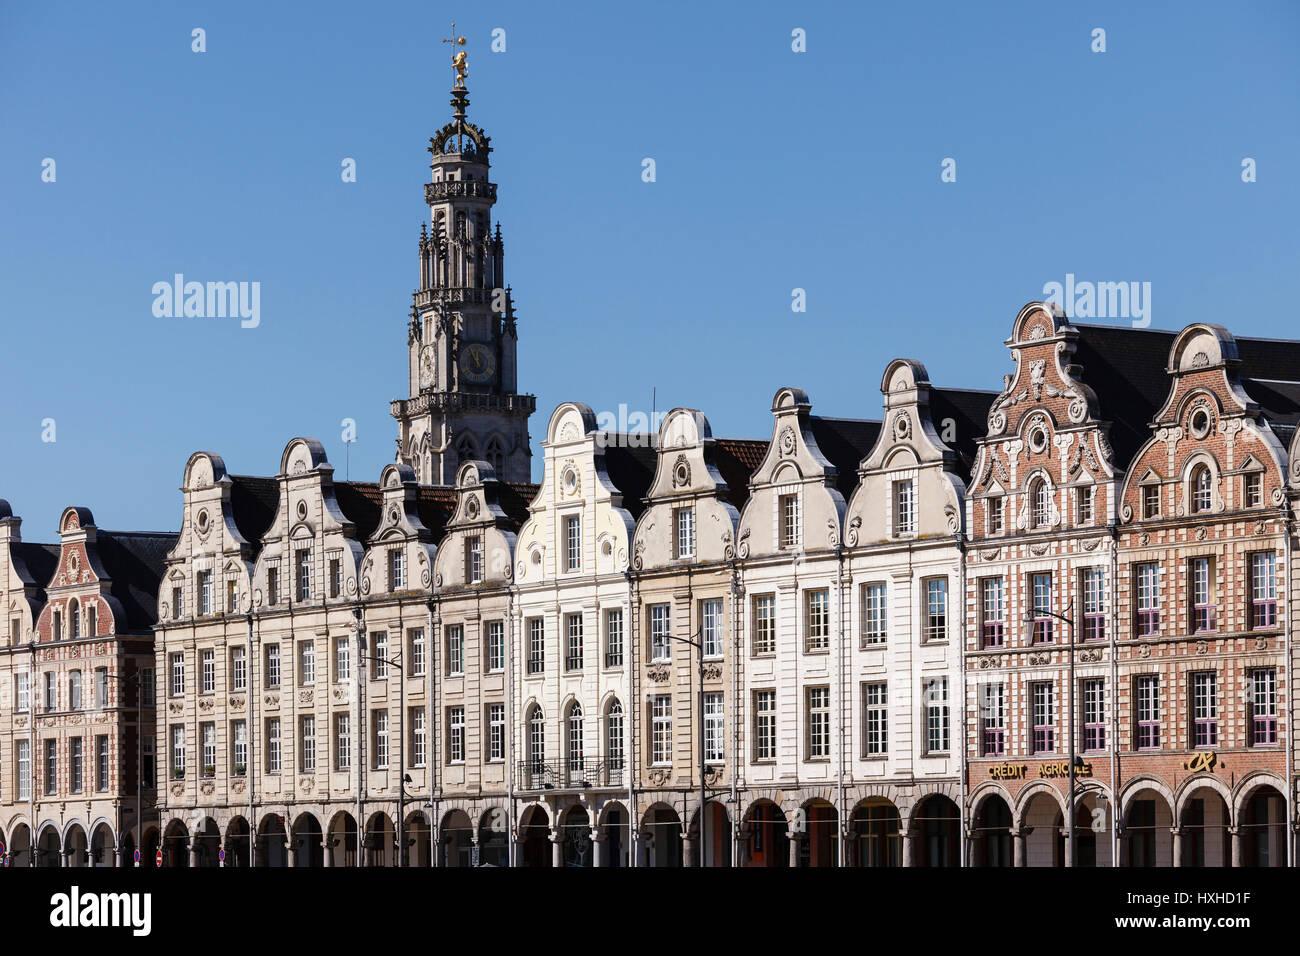 Flemish baroque style facades in the Grand Place, Arras, Pas-de-Calais, France - Stock Image